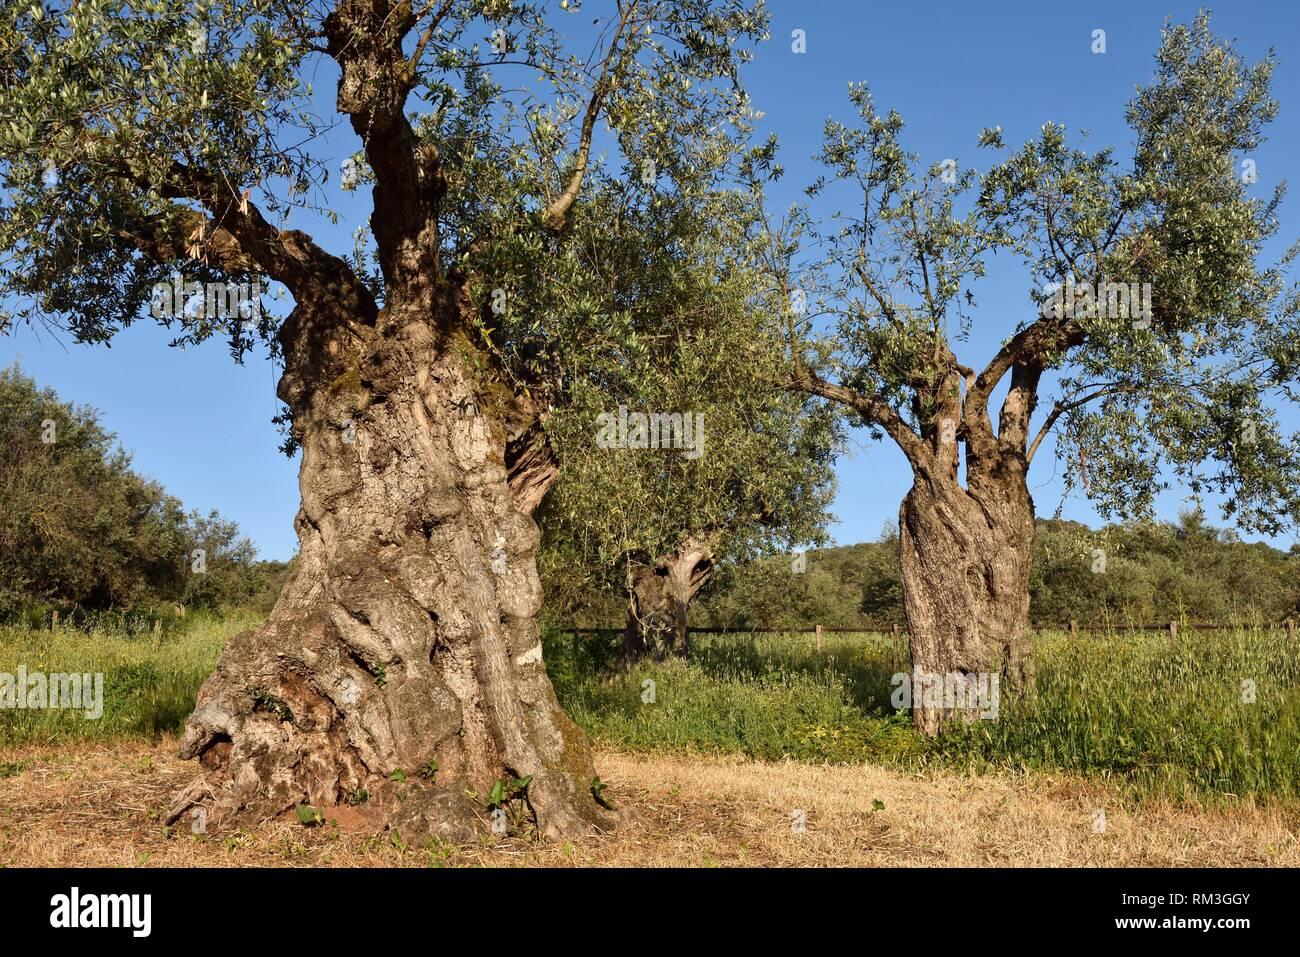 olive grove with some millennial olive trees in the gardens of the rural hotel Horta da Moura, Monsaraz, Reguengos de Monsaraz, Alentejo region, - Stock Image